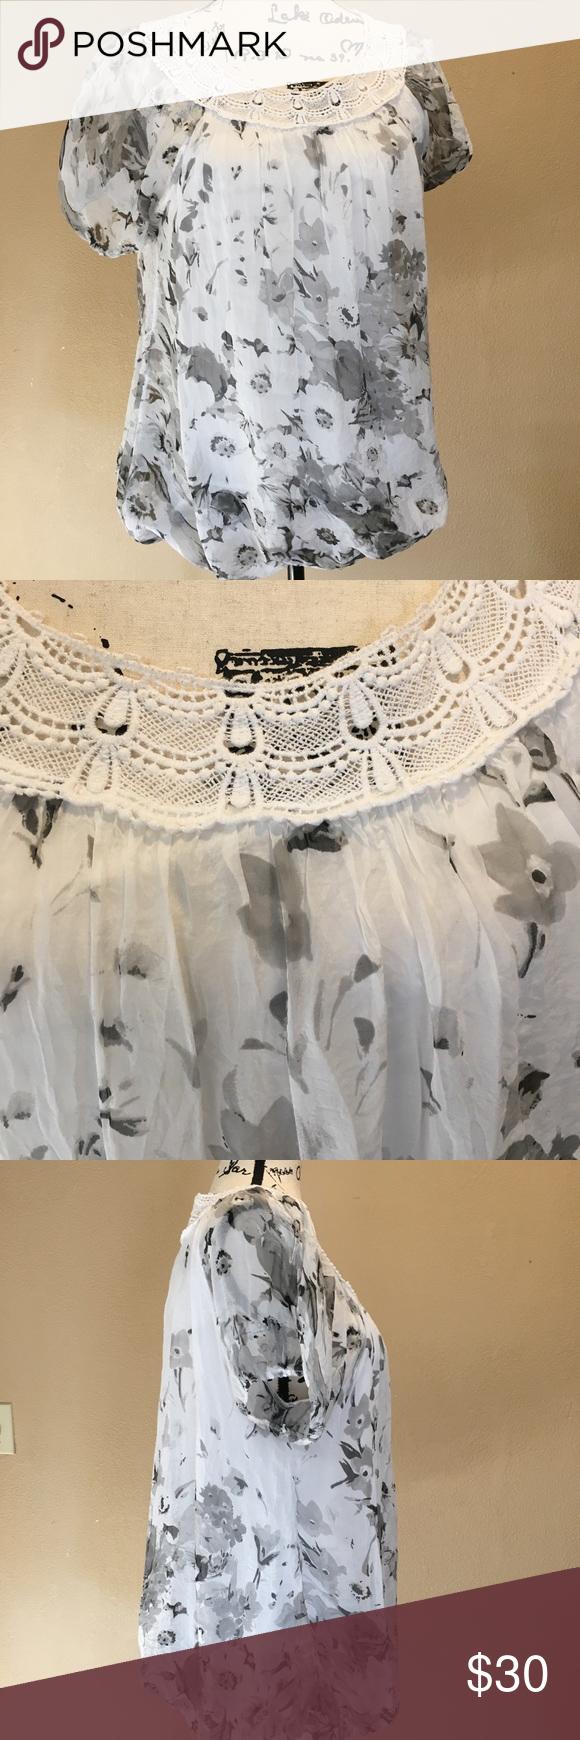 "4ce8e1dedce047 Elena Baldi silk crochet blouse Made in Italy. 21"" bust when laid across  flat"